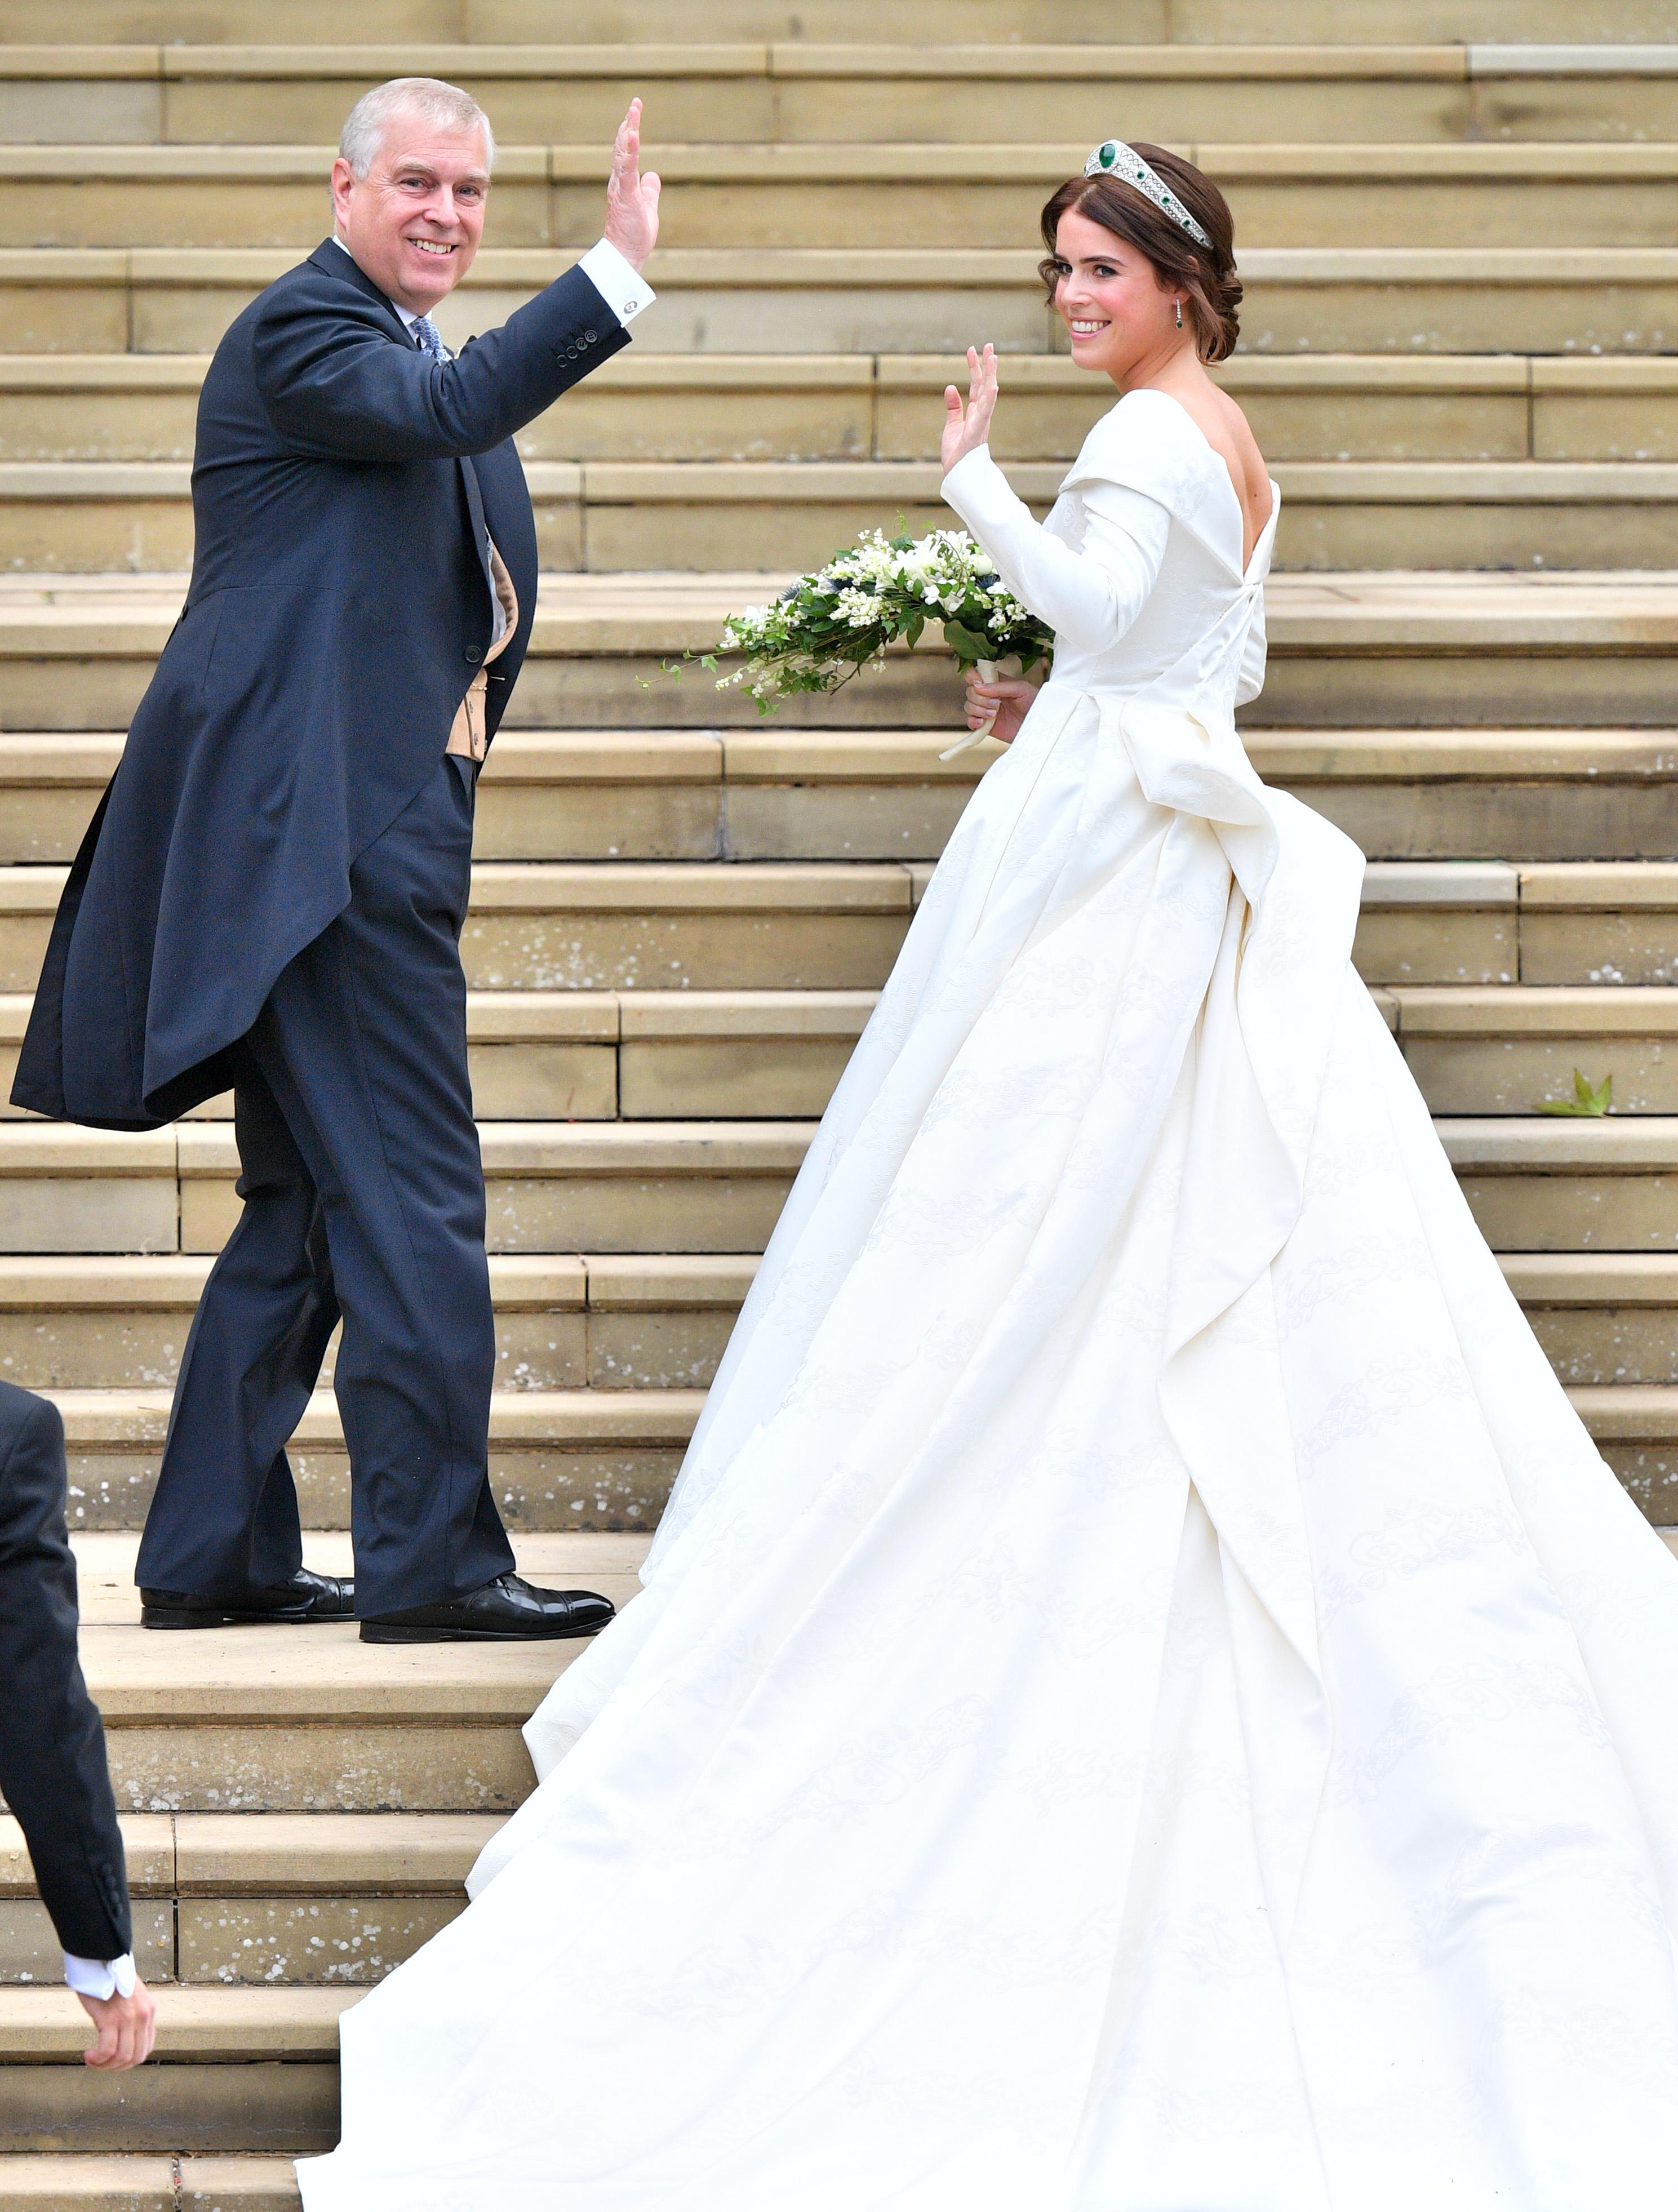 Prince Andrew and Princess EugenieThe wedding of Princess Eugenie and Jack Brooksbank, Pre-Ceremony, Windsor, Berkshire, UK - 12 Oct 2018WEARING PETER PILOTTO